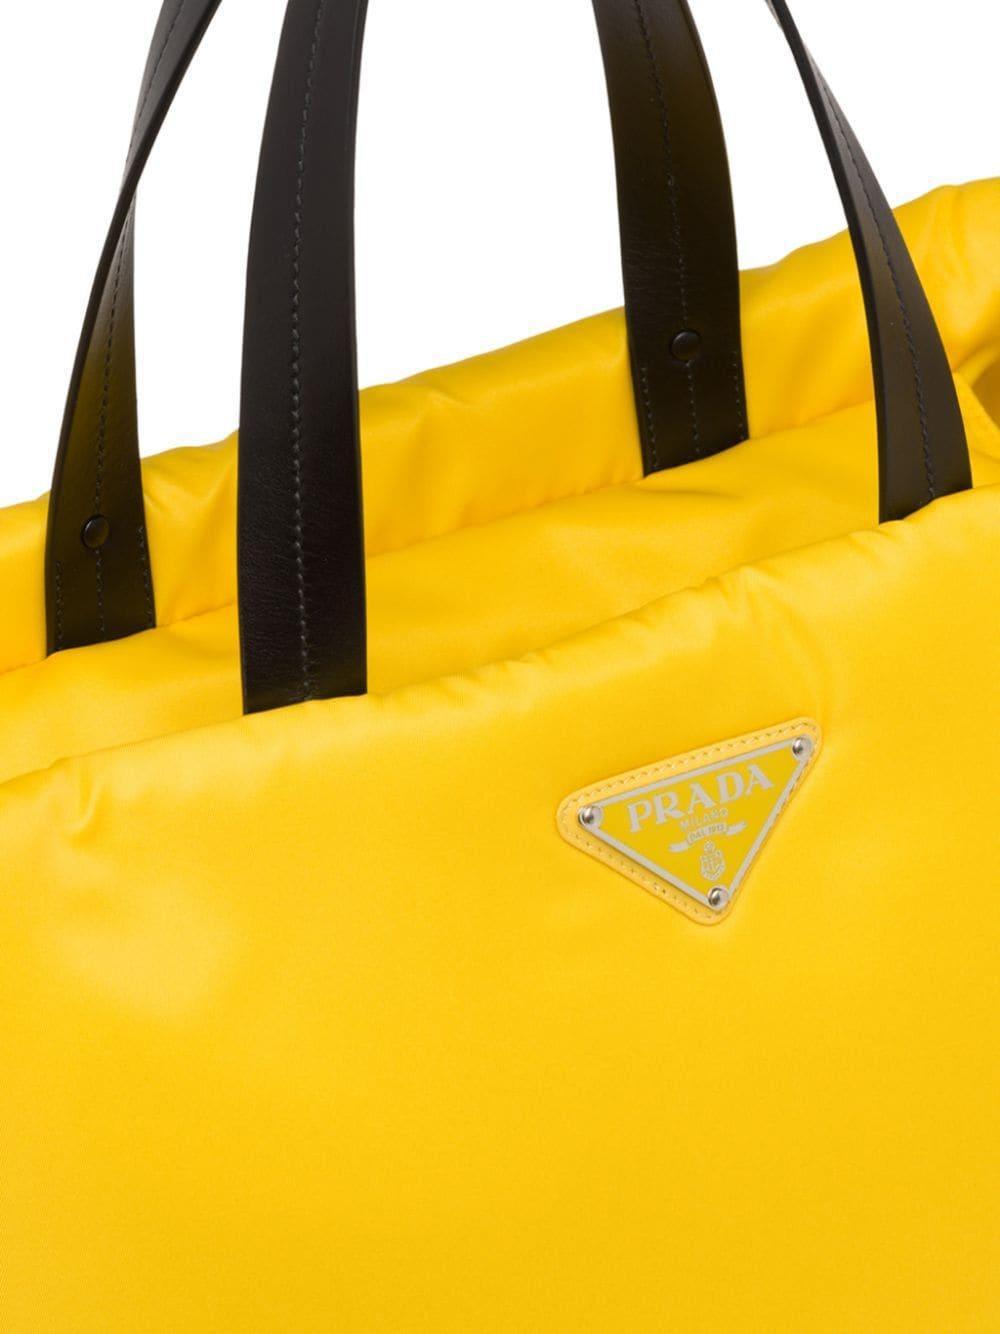 Sac cabas médium à design matelassé Synthétique Prada en coloris Jaune